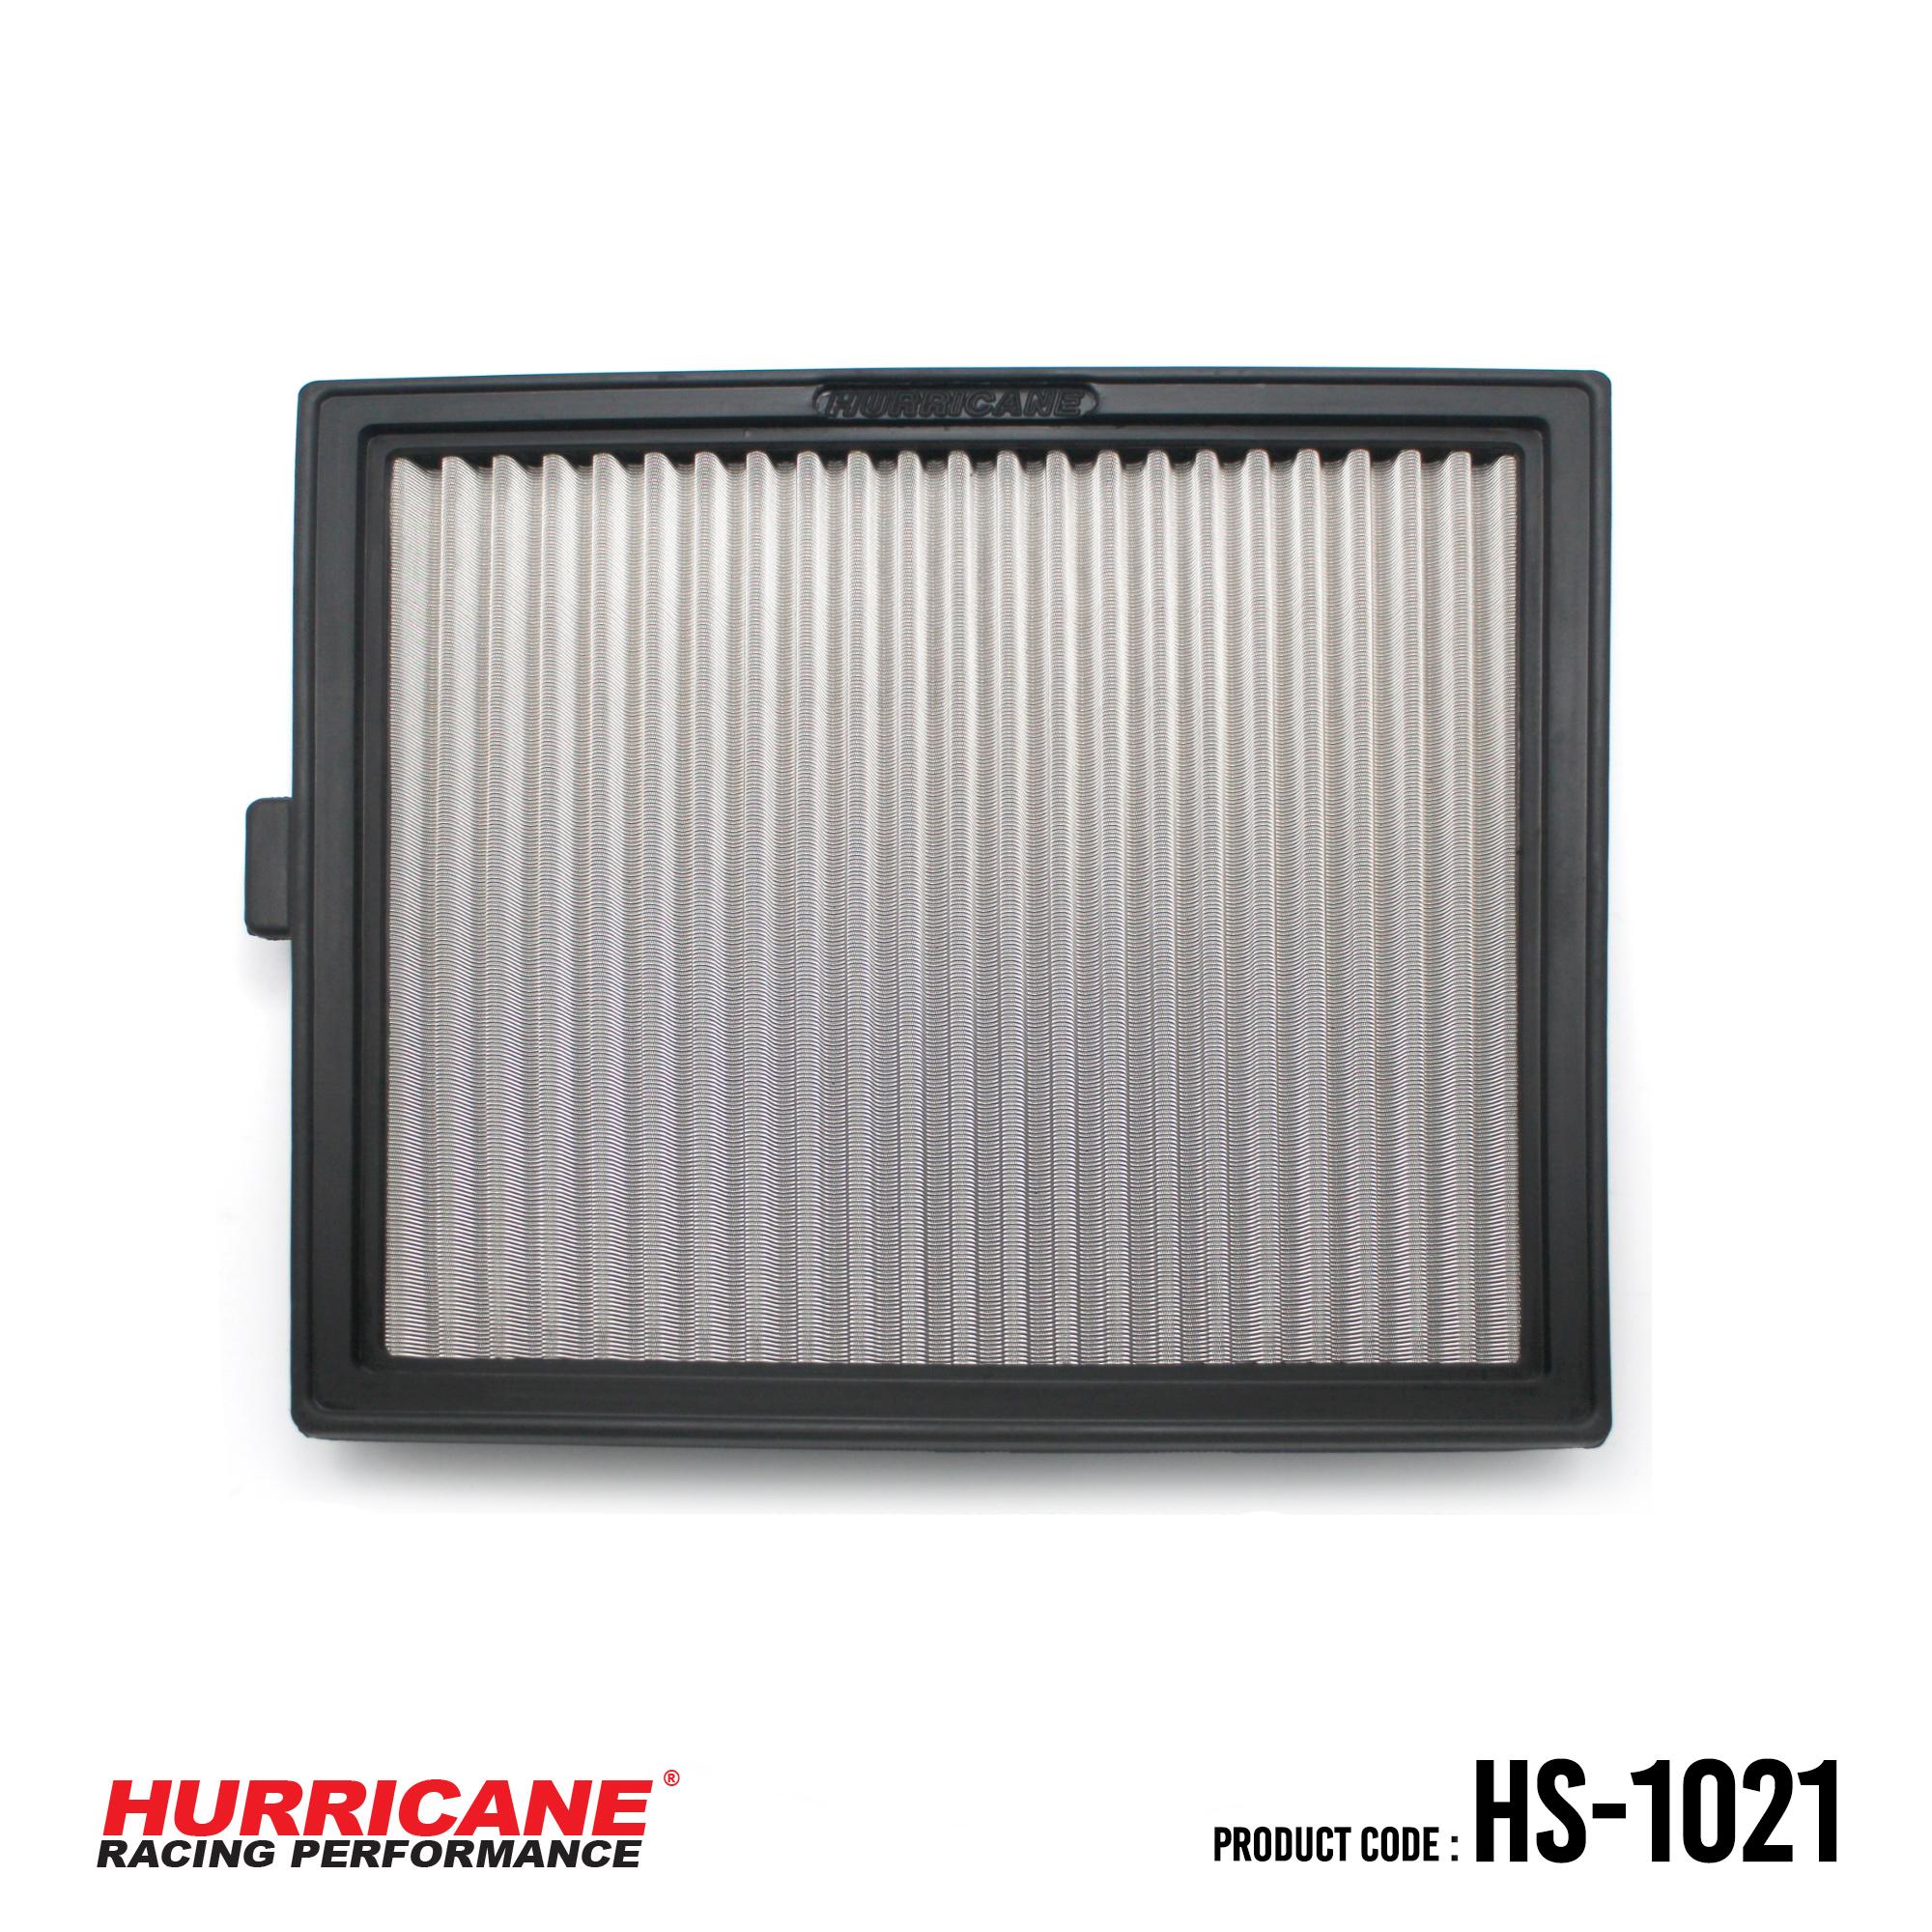 HURRICANE STAINLESS STEEL AIR FILTER FOR HS-1021 Isuzu